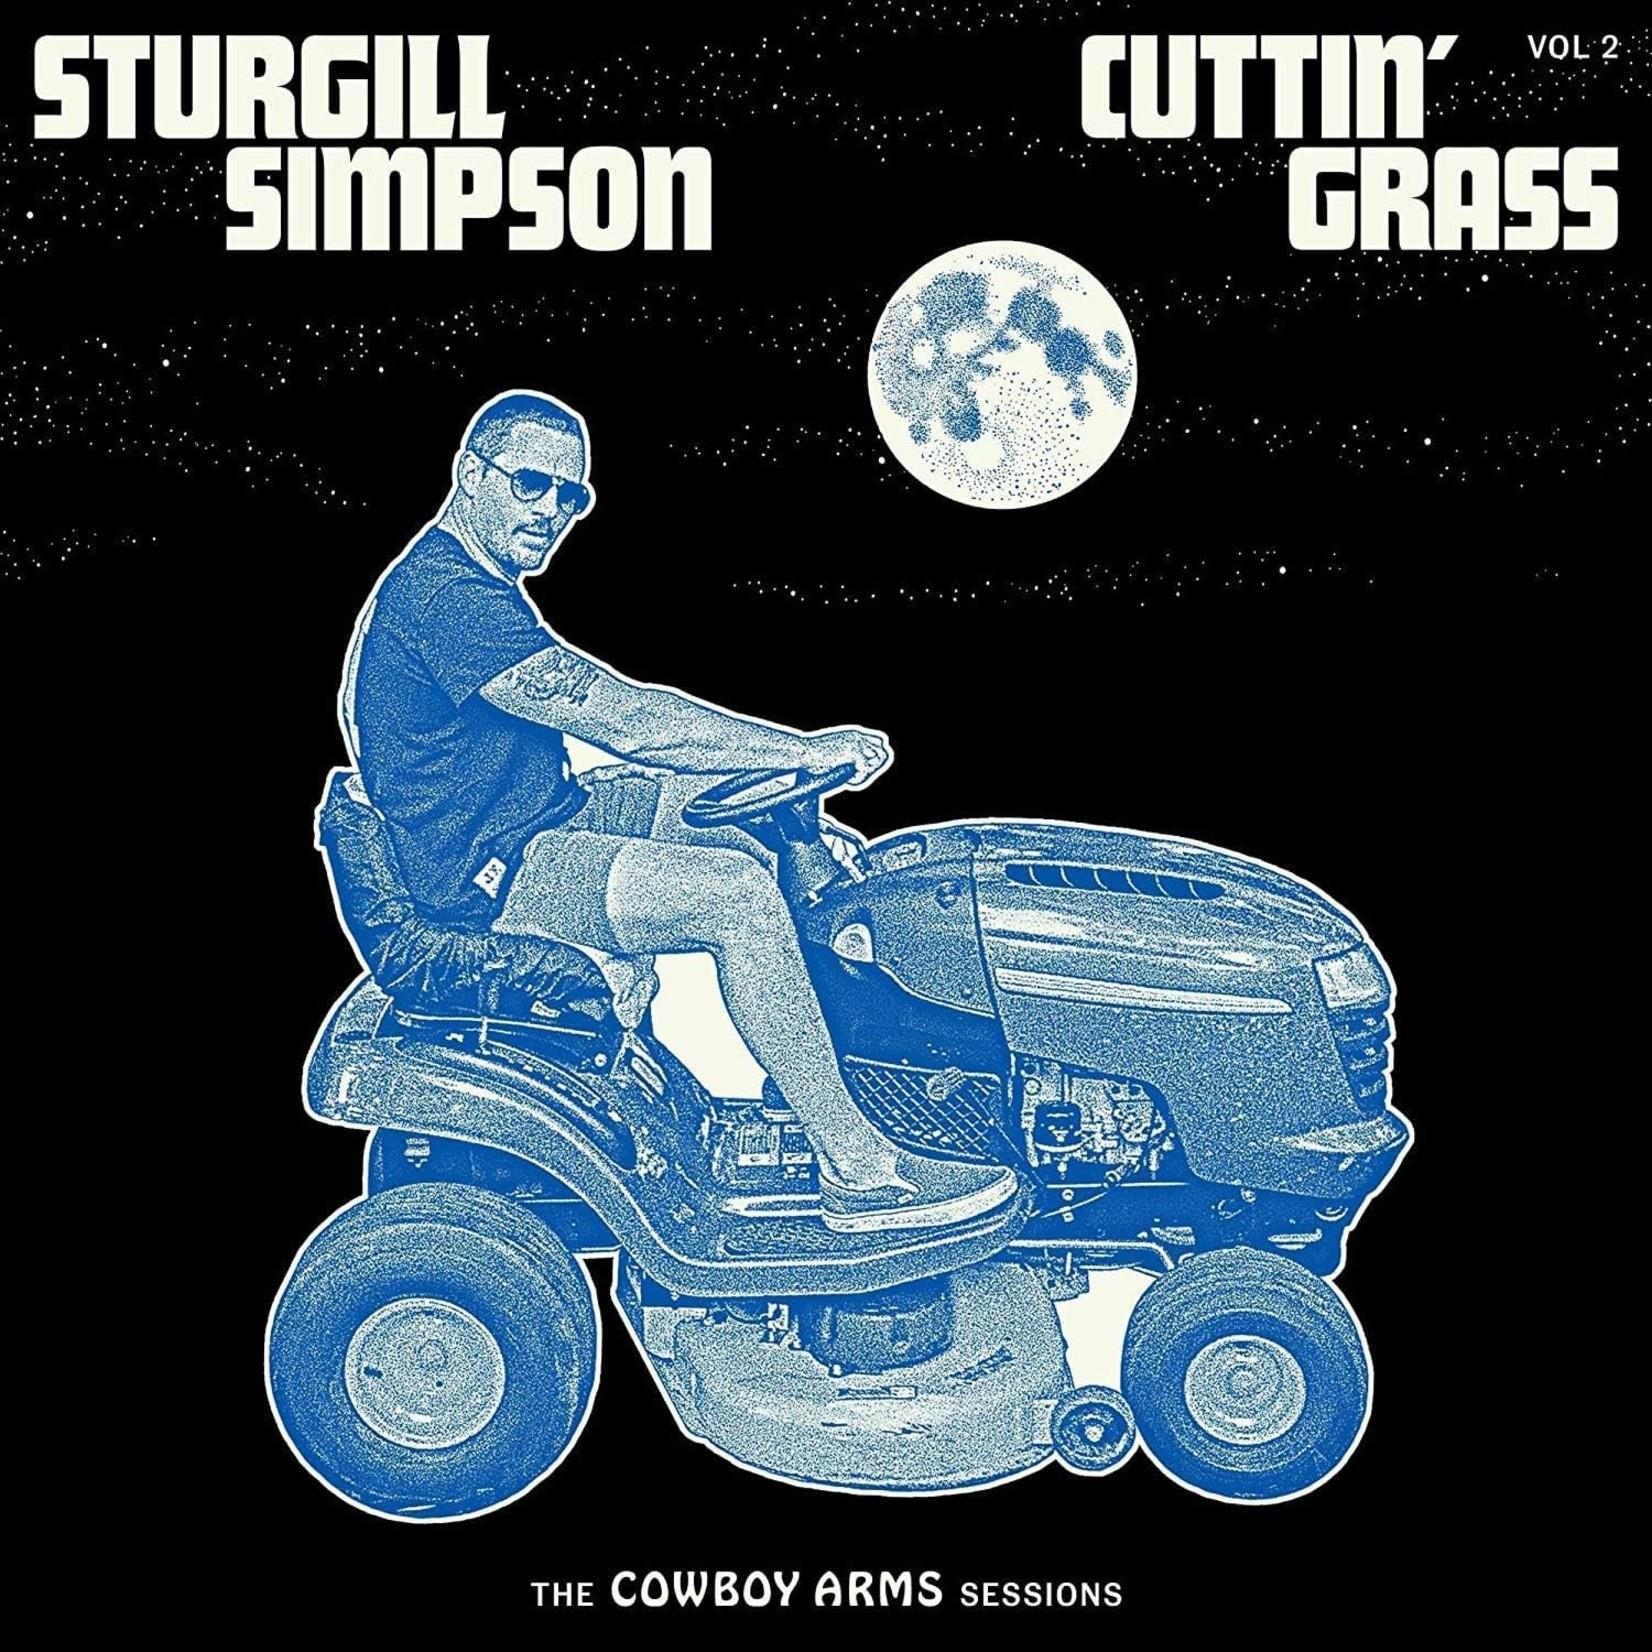 STURGILL SIMPSON CUTTIN' GRASS VOL. 2  COWBOY ARMS SESSIONS  LP